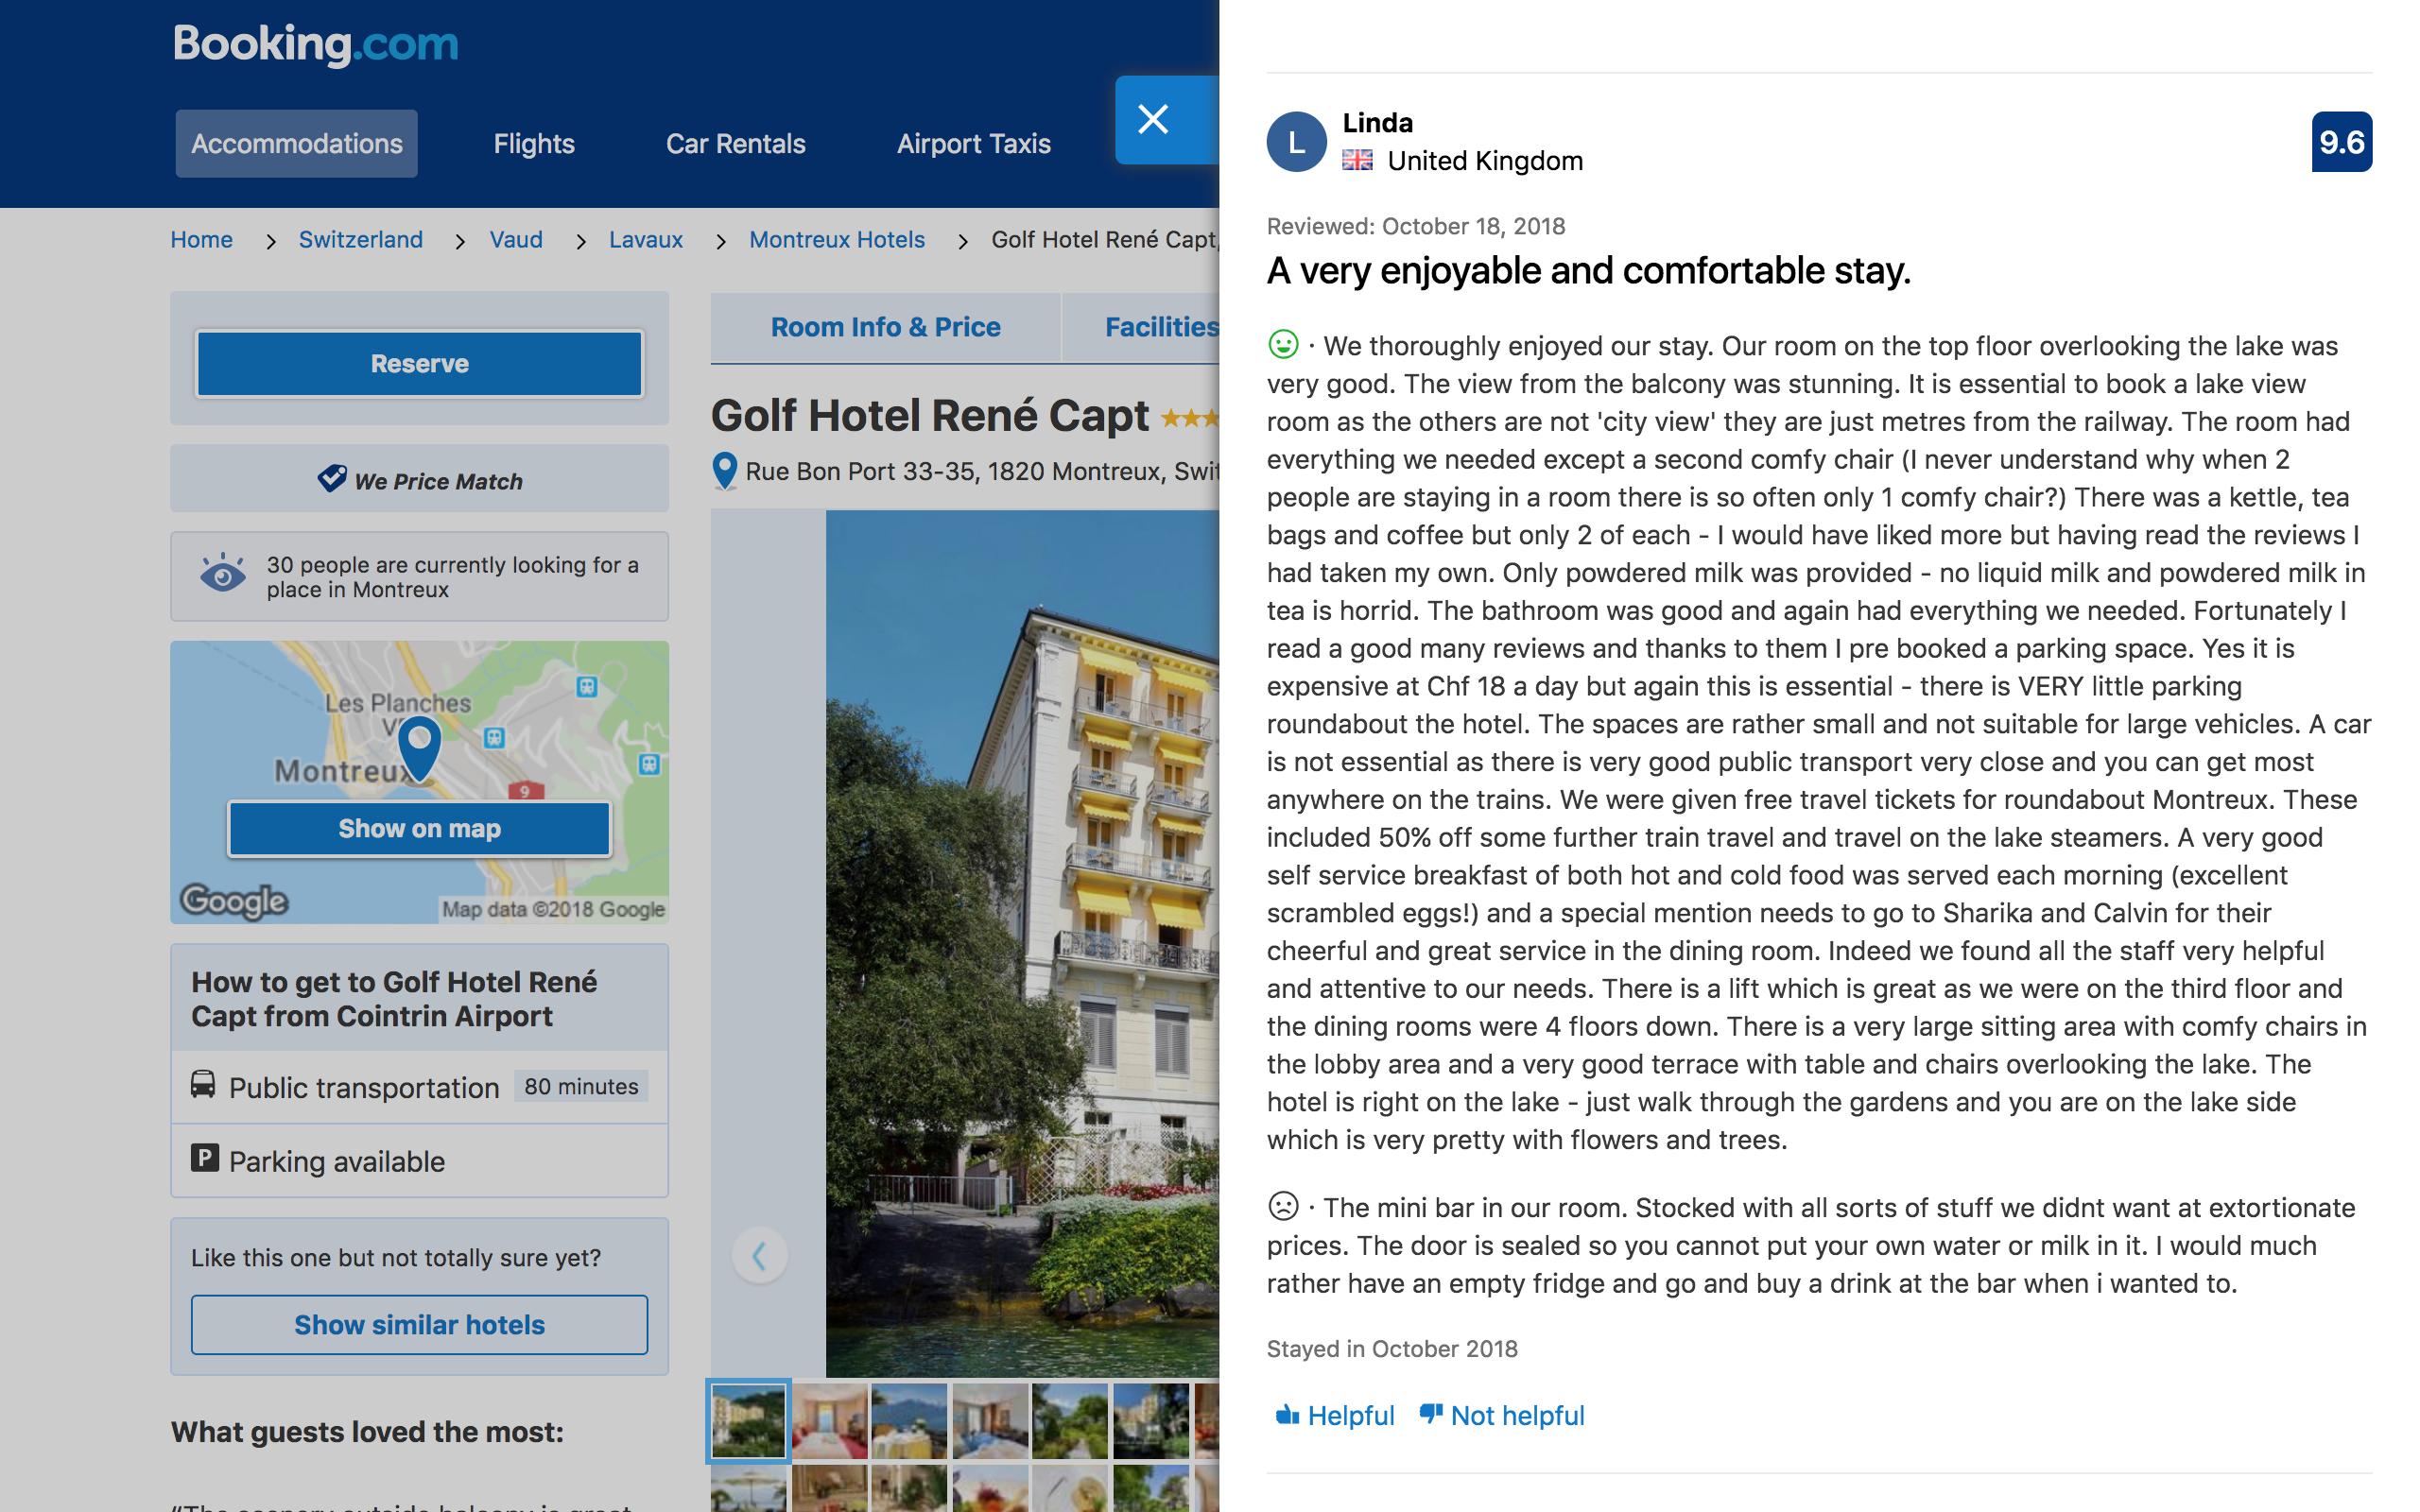 Guest Review at Golf-Hôtel René Capt, Montreux on 18 October 2018.png